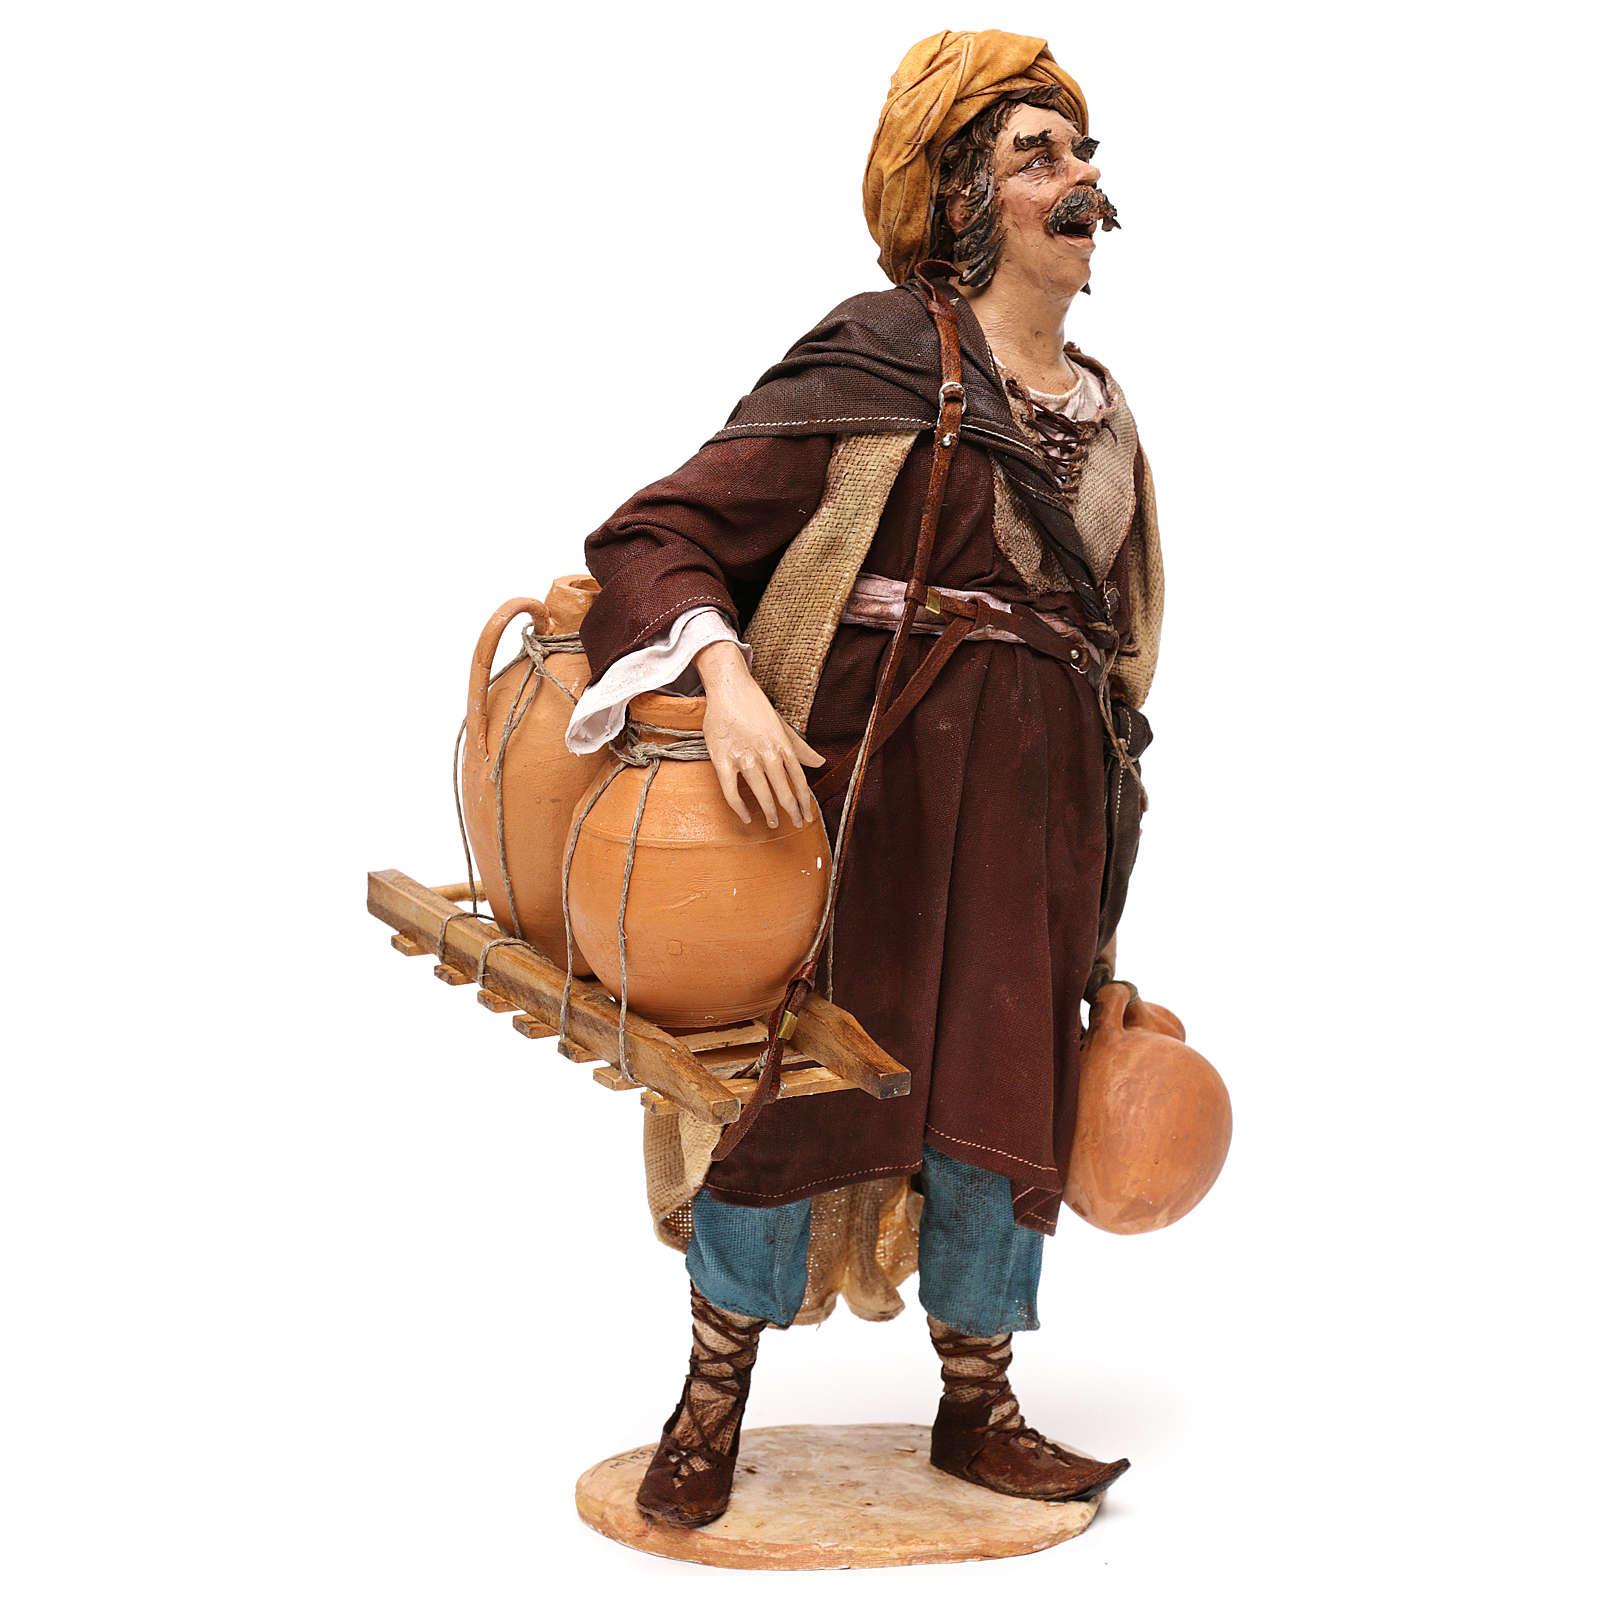 Pastore portatore di anfore 30 cm Angela Tripi terracotta 4